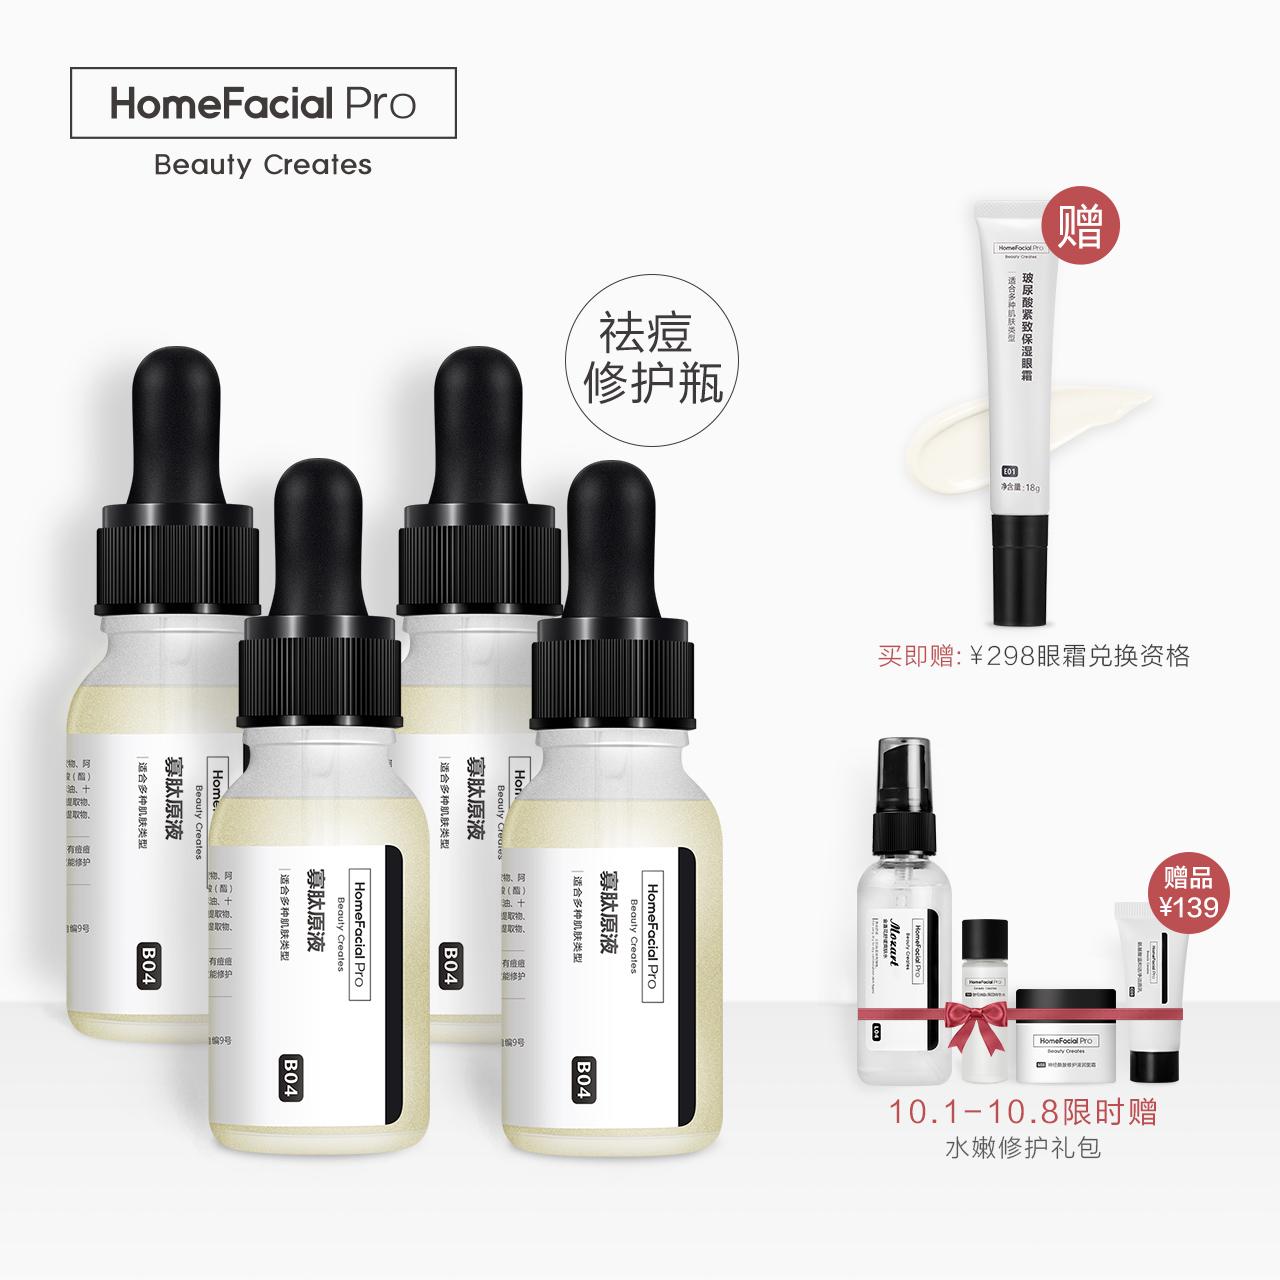 HFP 寡肽原液4瓶套装淡化痘印去痘疤精华液男女